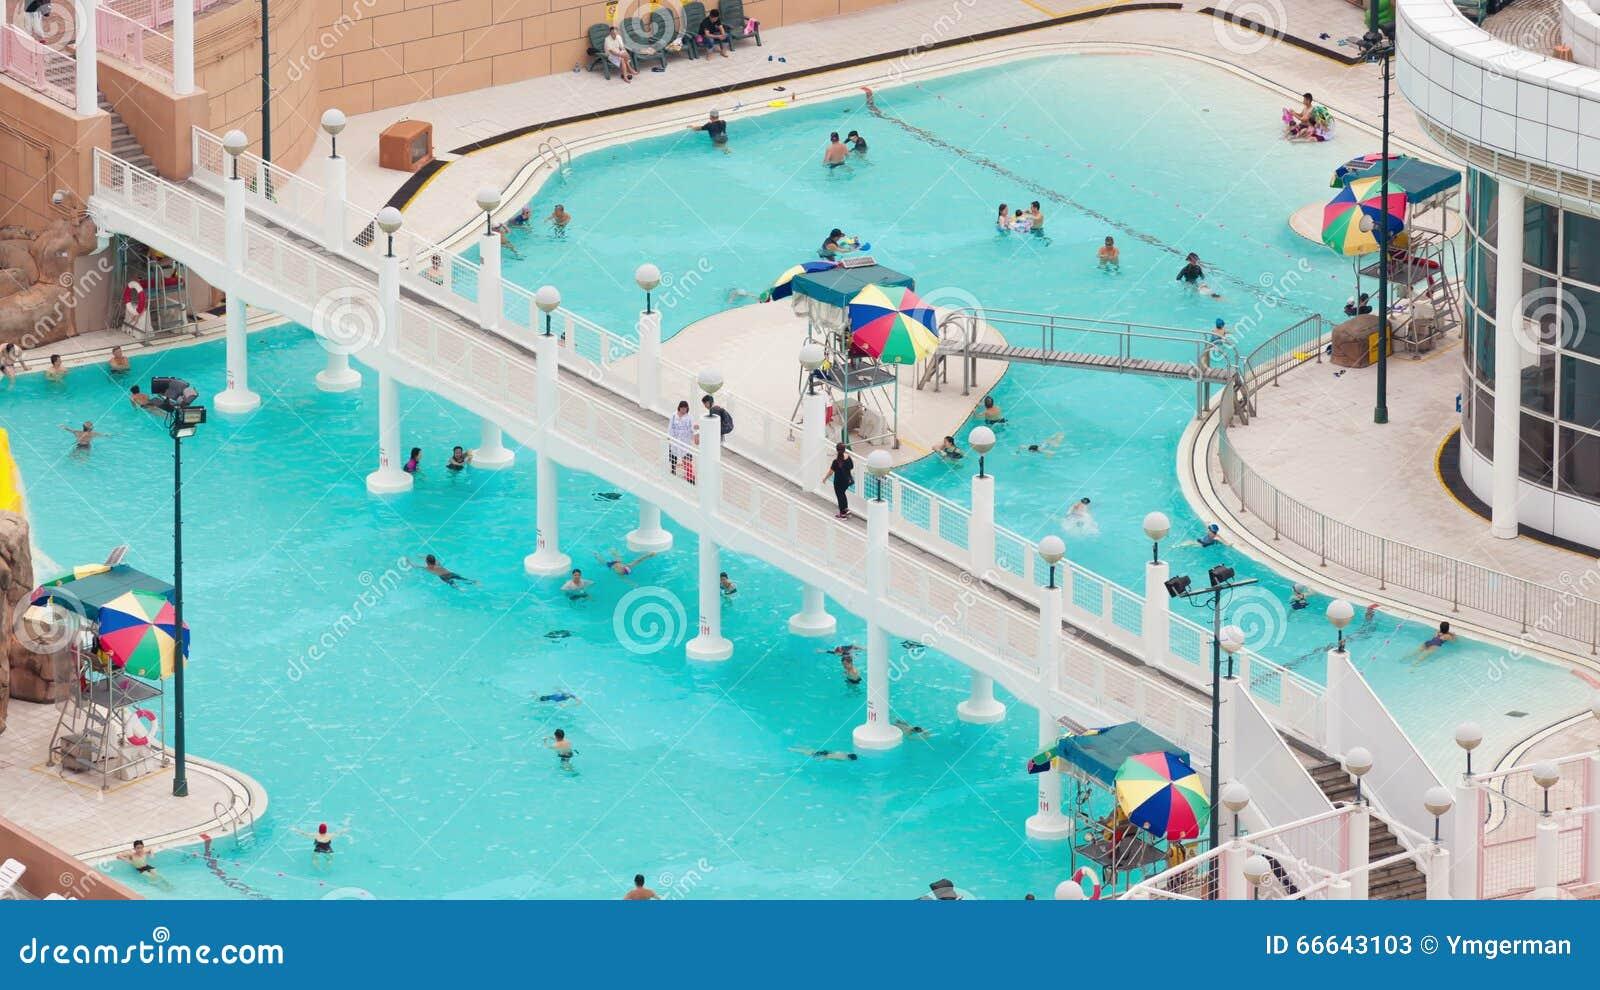 Public swimming pool stock footage videos 384 stock videos for Alderwood pool public swim times